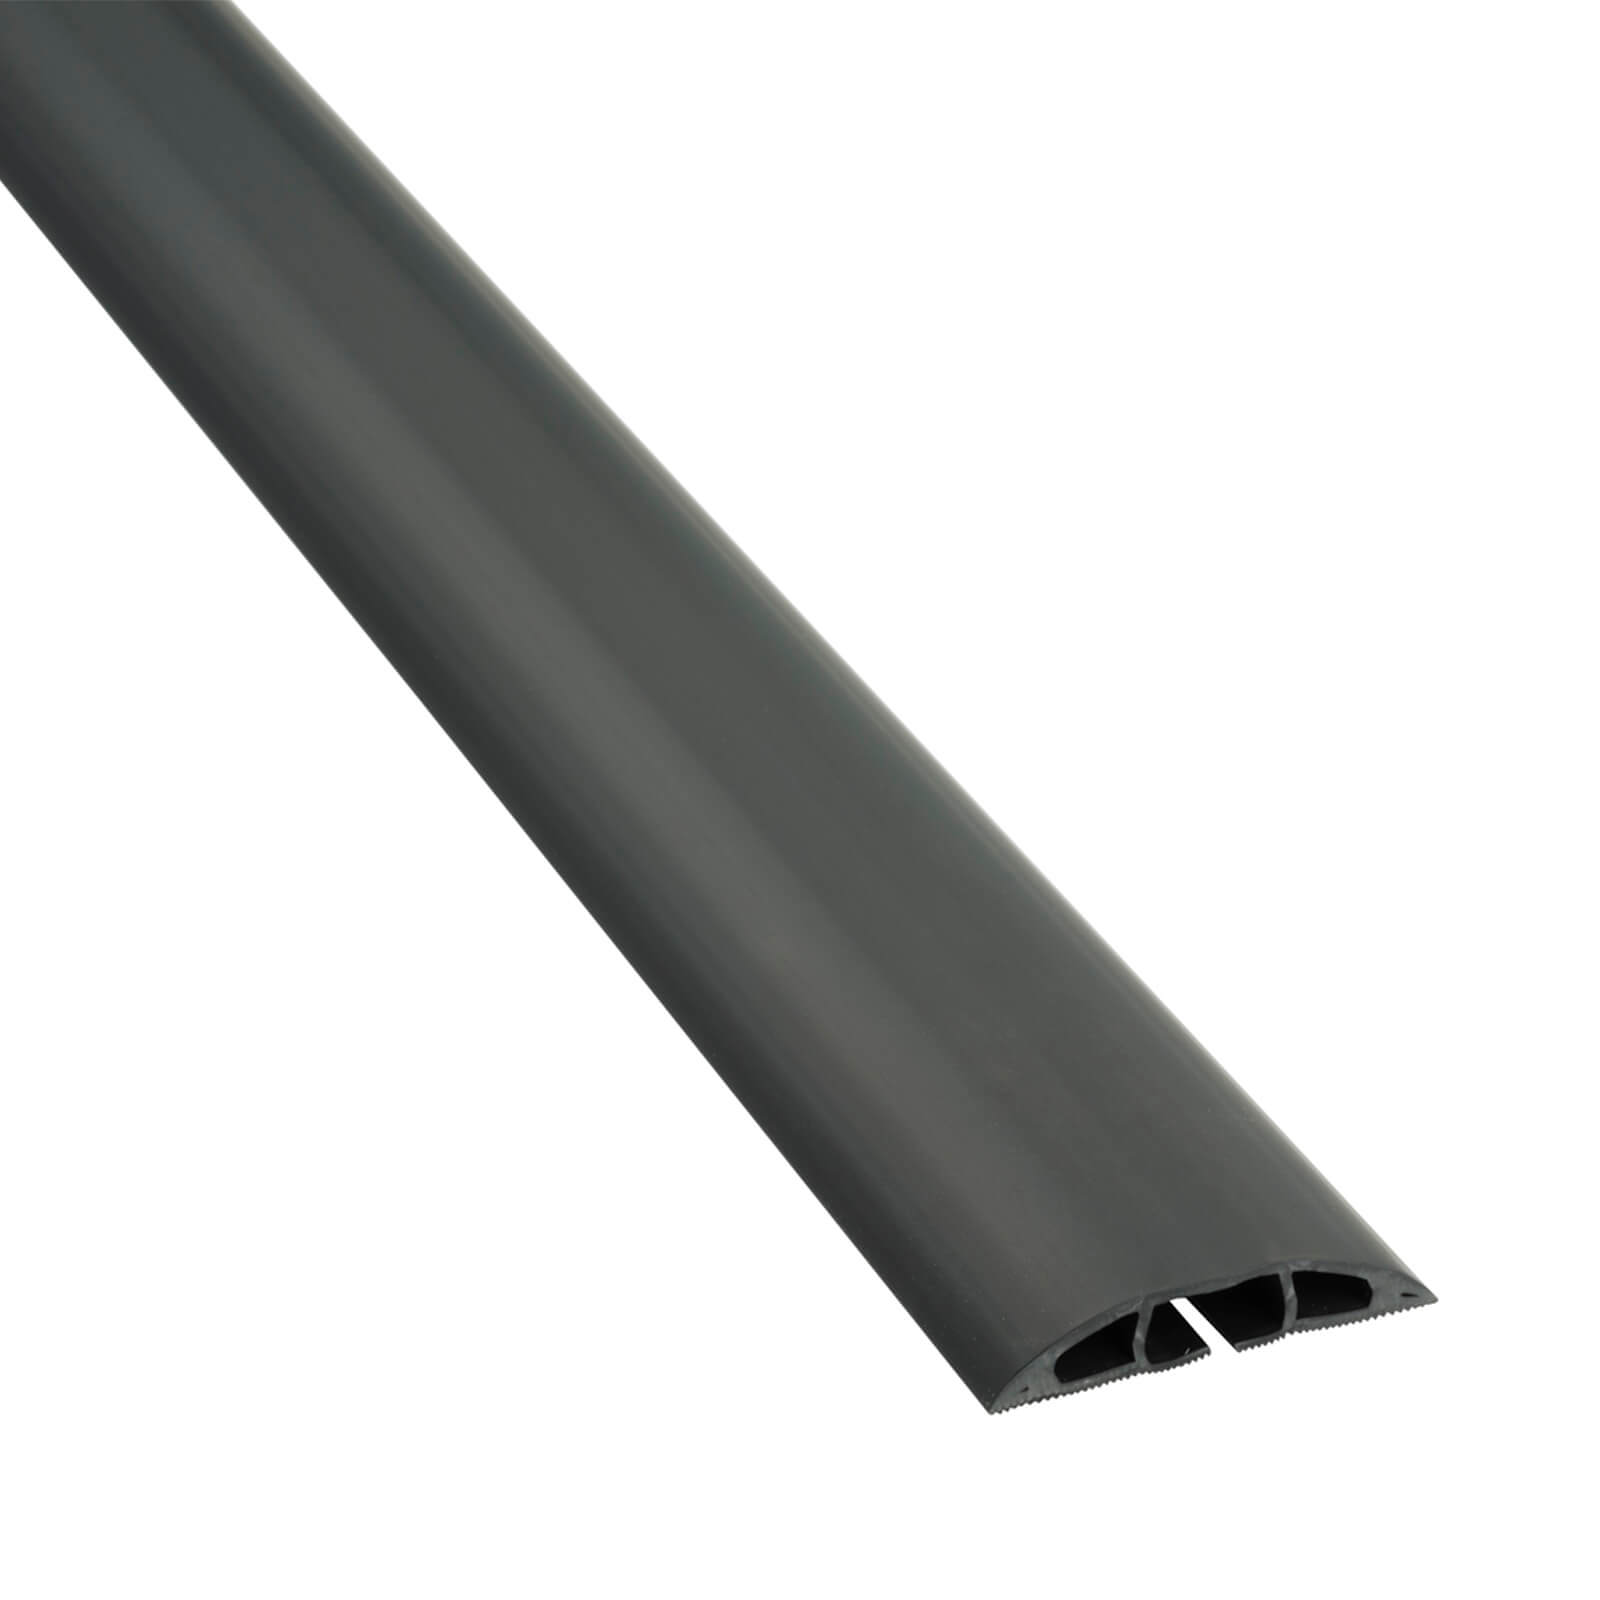 D-Line Light Duty Floor Cable Cover 17mm x 9mm x 1.8m Black